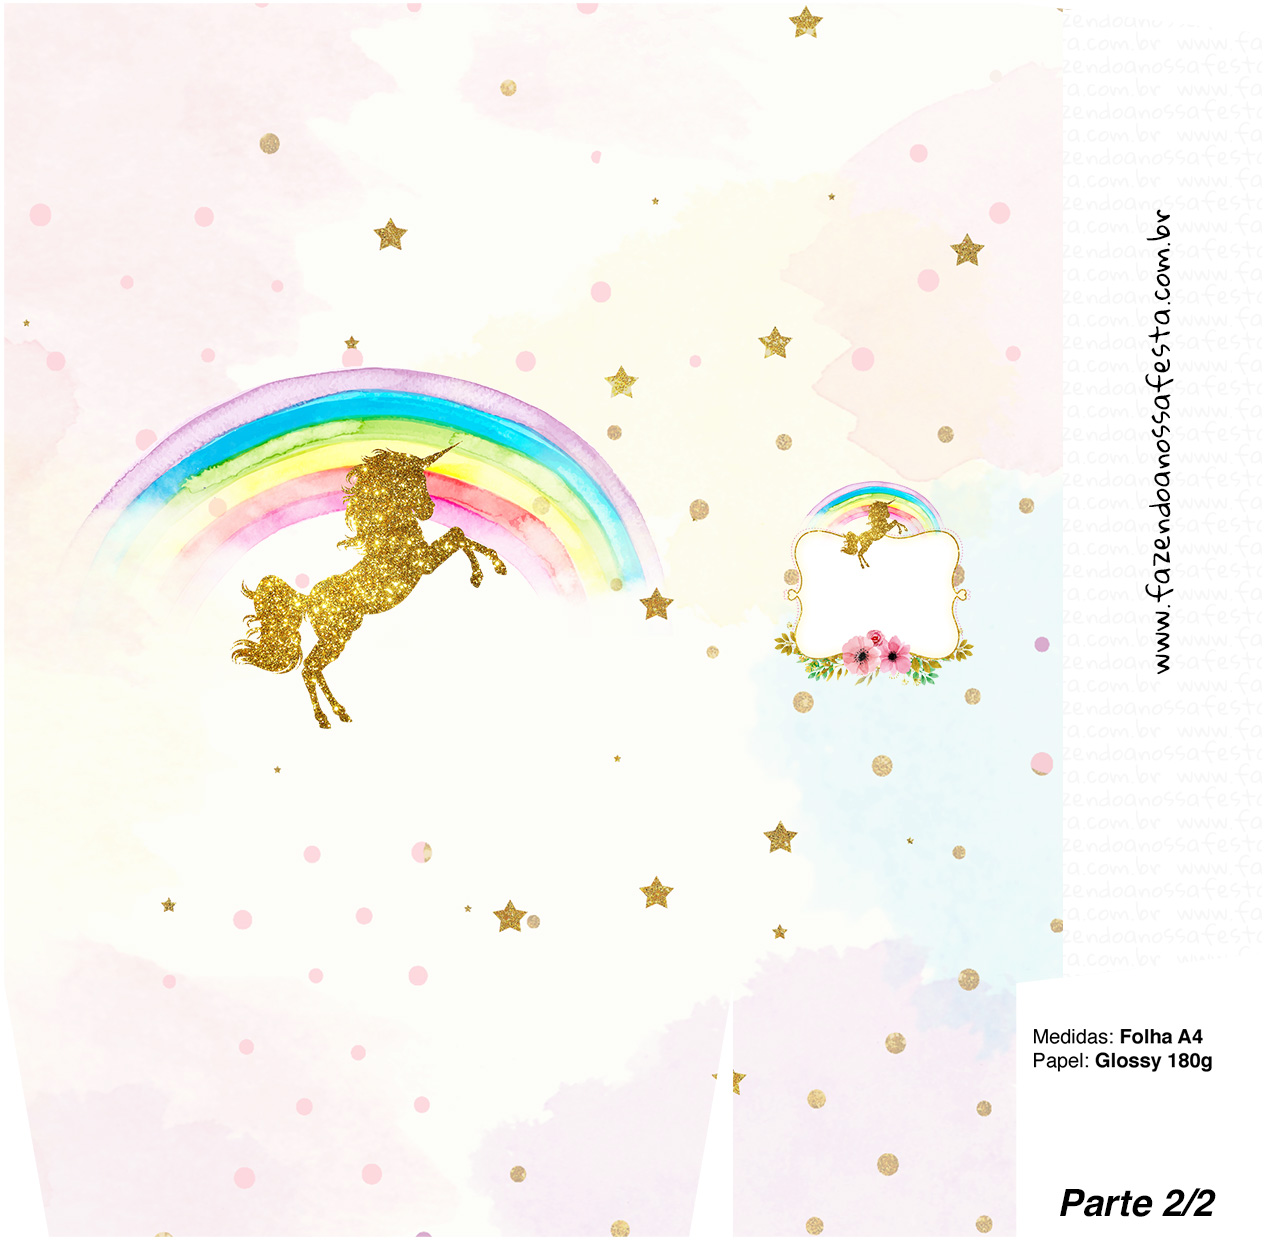 httpfazendoanossafestacombr201705unicornio kit festahtml unicorn printables pinterest unicorns and unicorn party